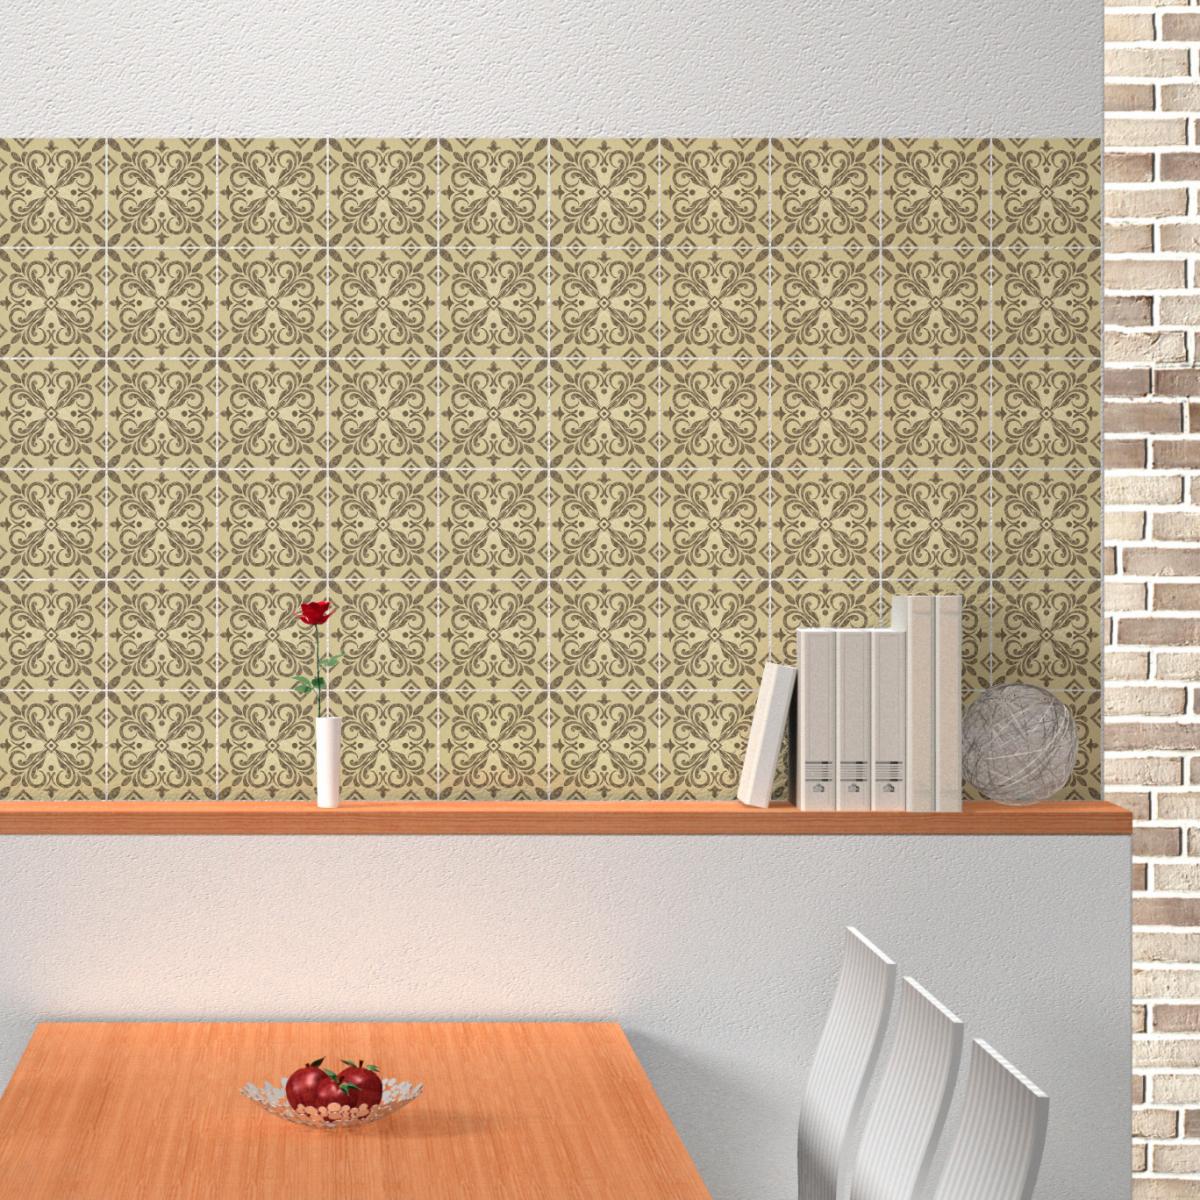 60 stickers carrelages azulejos jordano salle de bain et wc salle de bain ambiance sticker. Black Bedroom Furniture Sets. Home Design Ideas